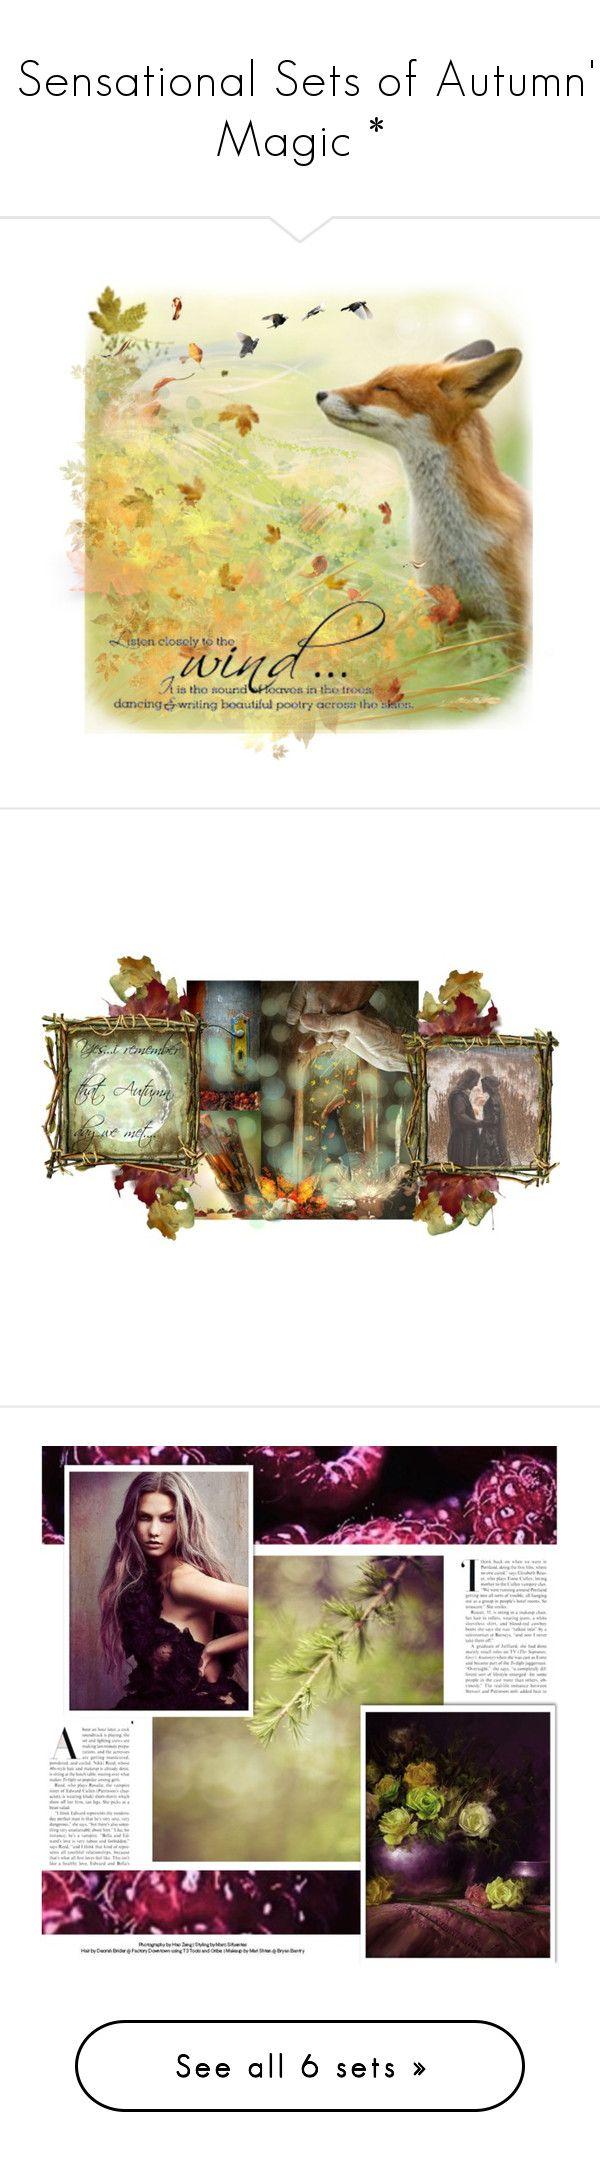 """* Sensational Sets of Autumn's Magic *"" by funkyjunkygypsy ❤ liked on Polyvore featuring art, Fall, artset, autumnart, fallart, purple, violet, dorataya, Cynthia Rowley and Alexander McQueen"